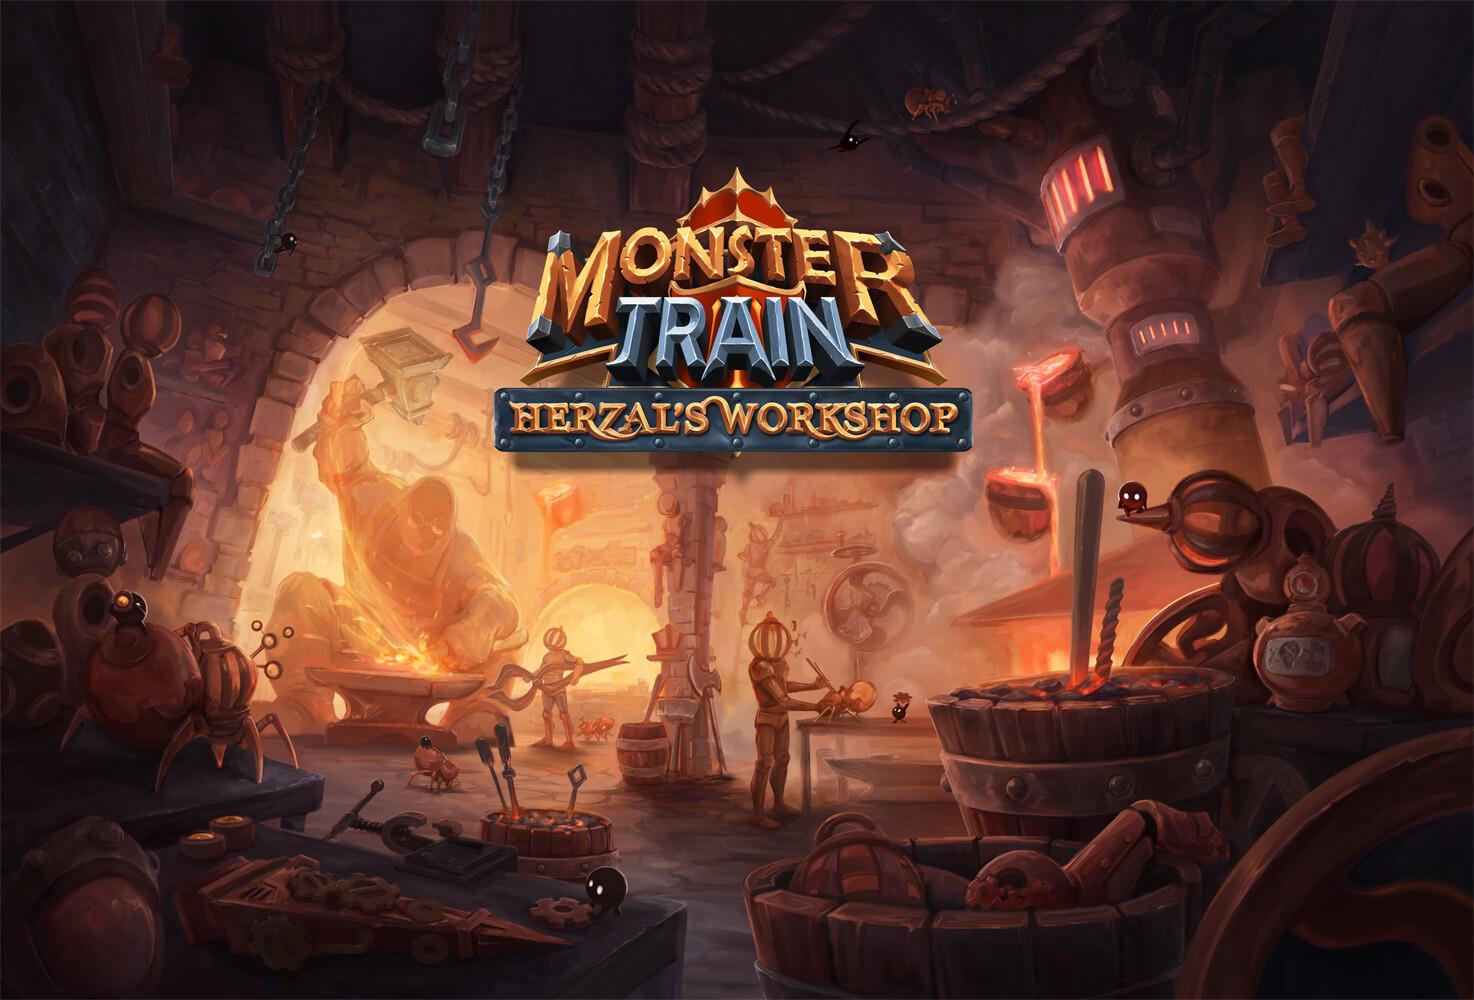 Monster Train: Herzal's Workshop